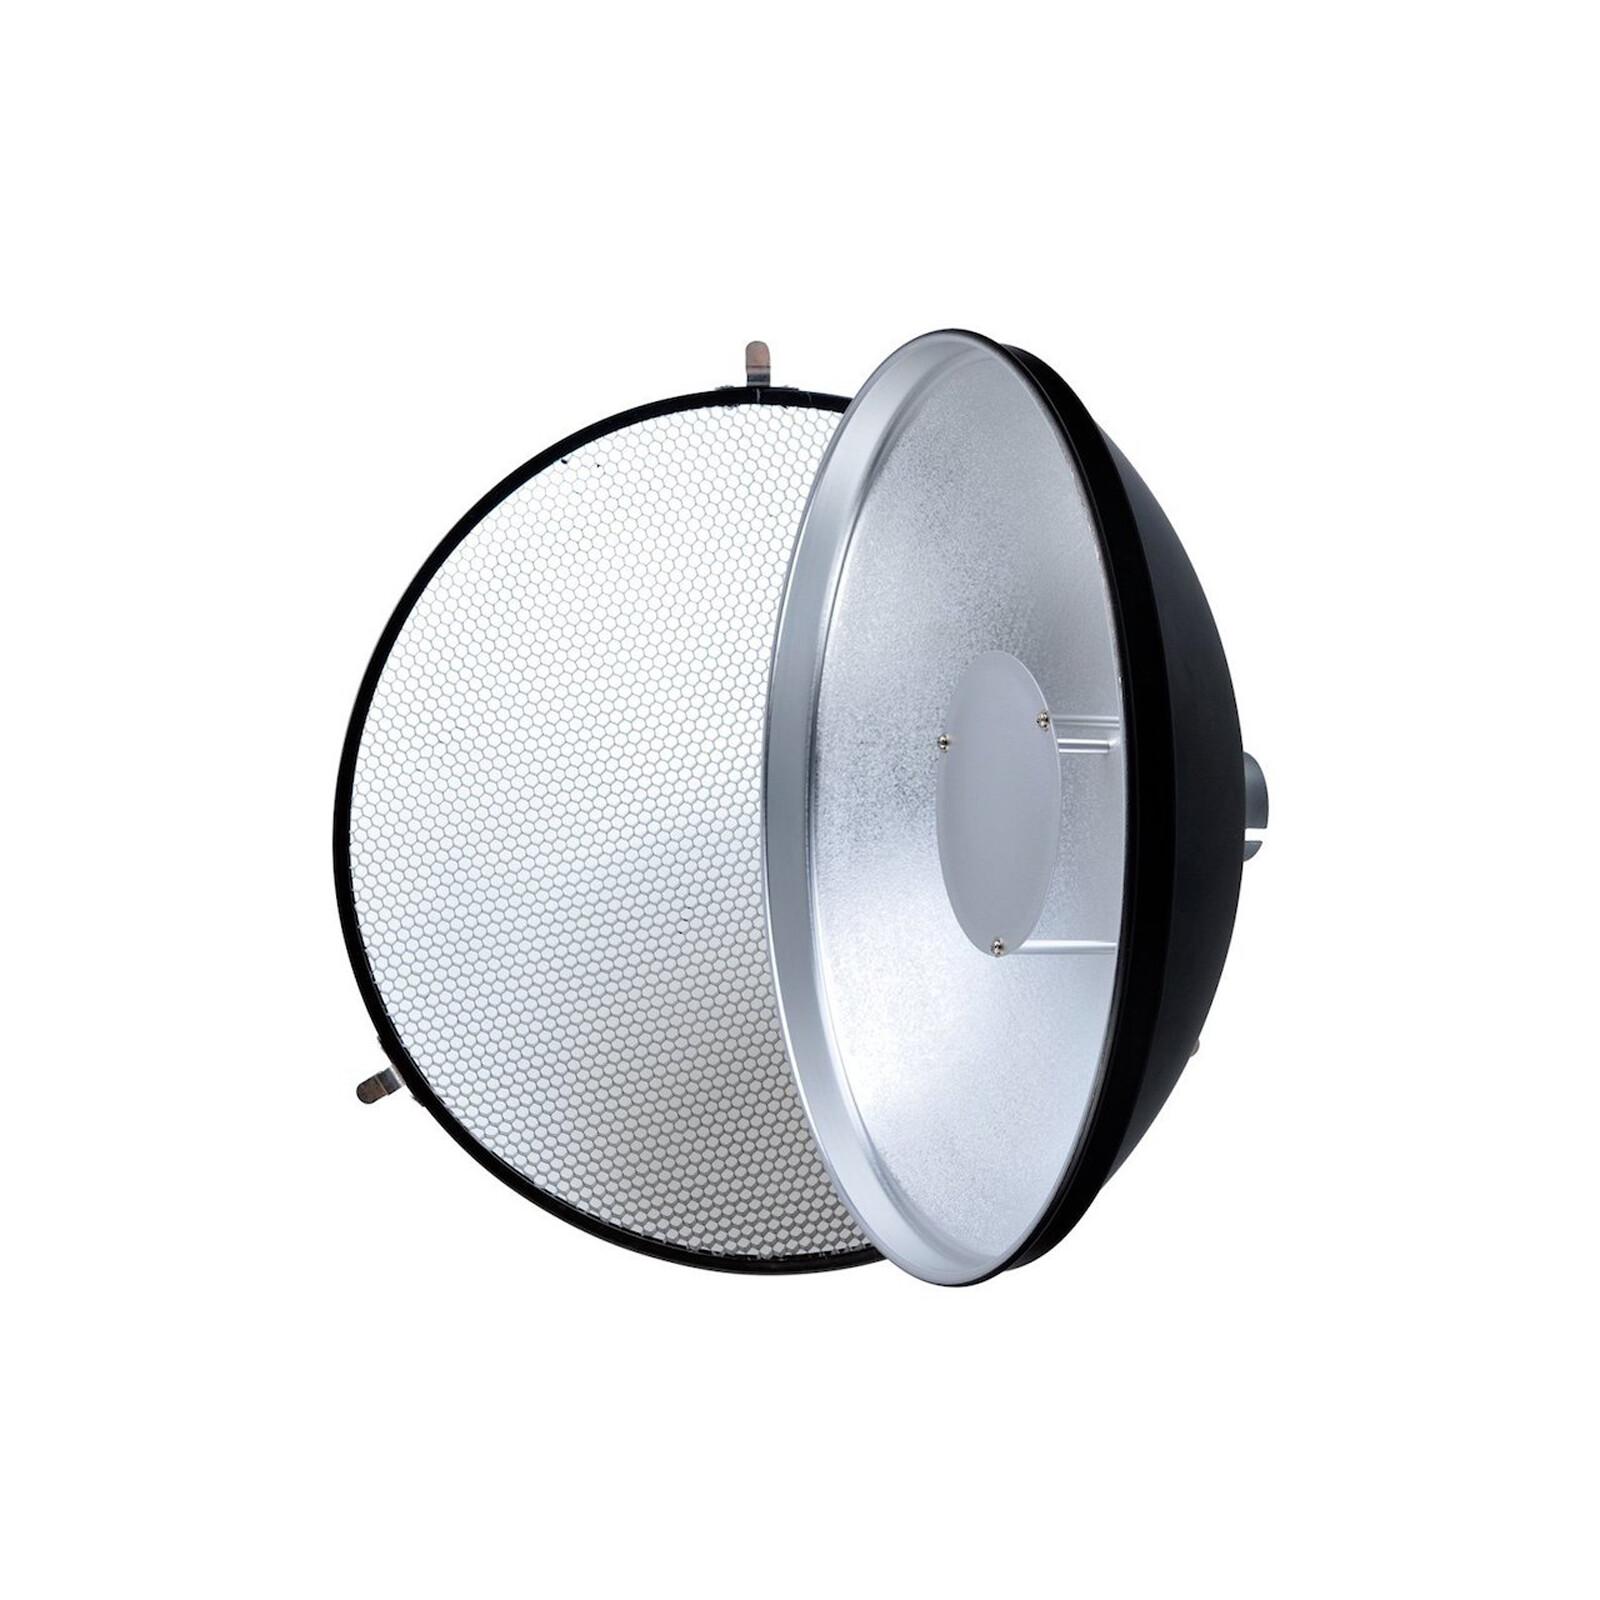 GODOX AD-S Flash Beauty Dish with Grid